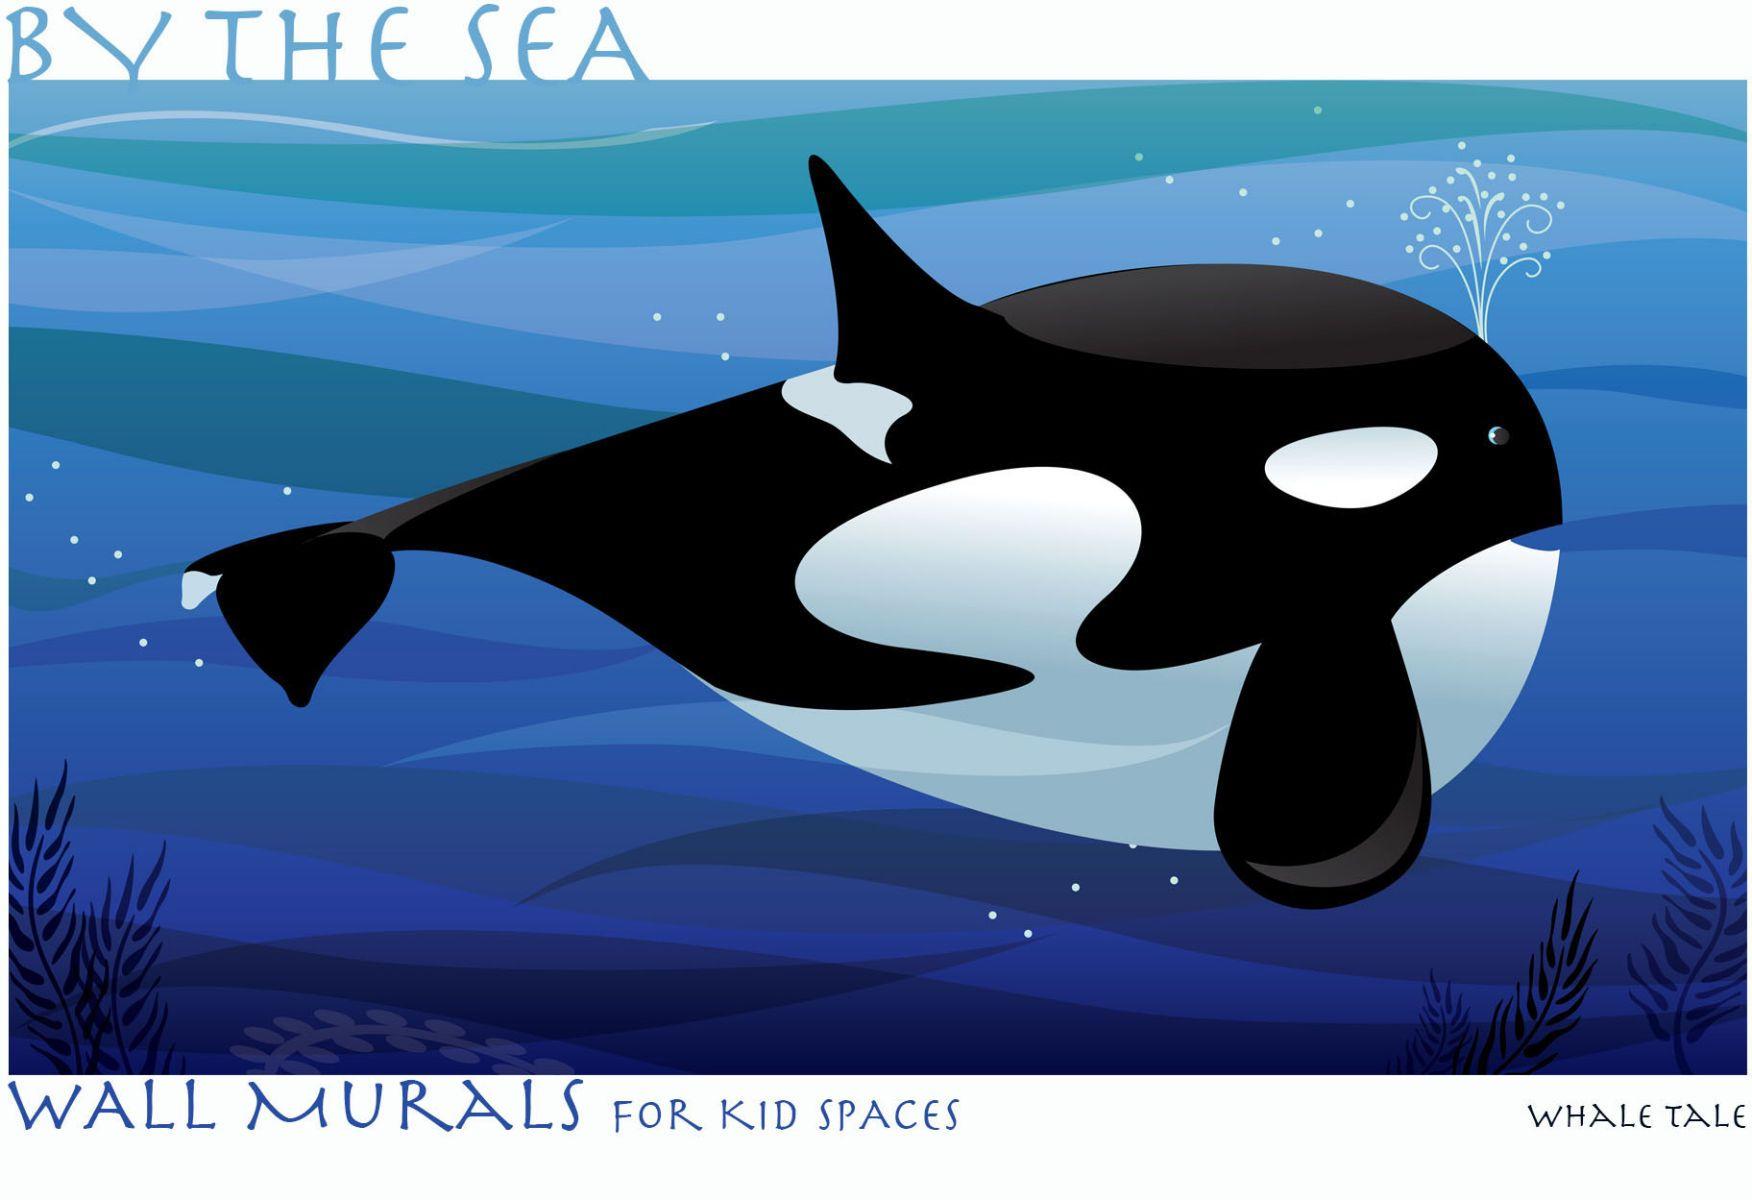 44_11-whale_tale.jpg